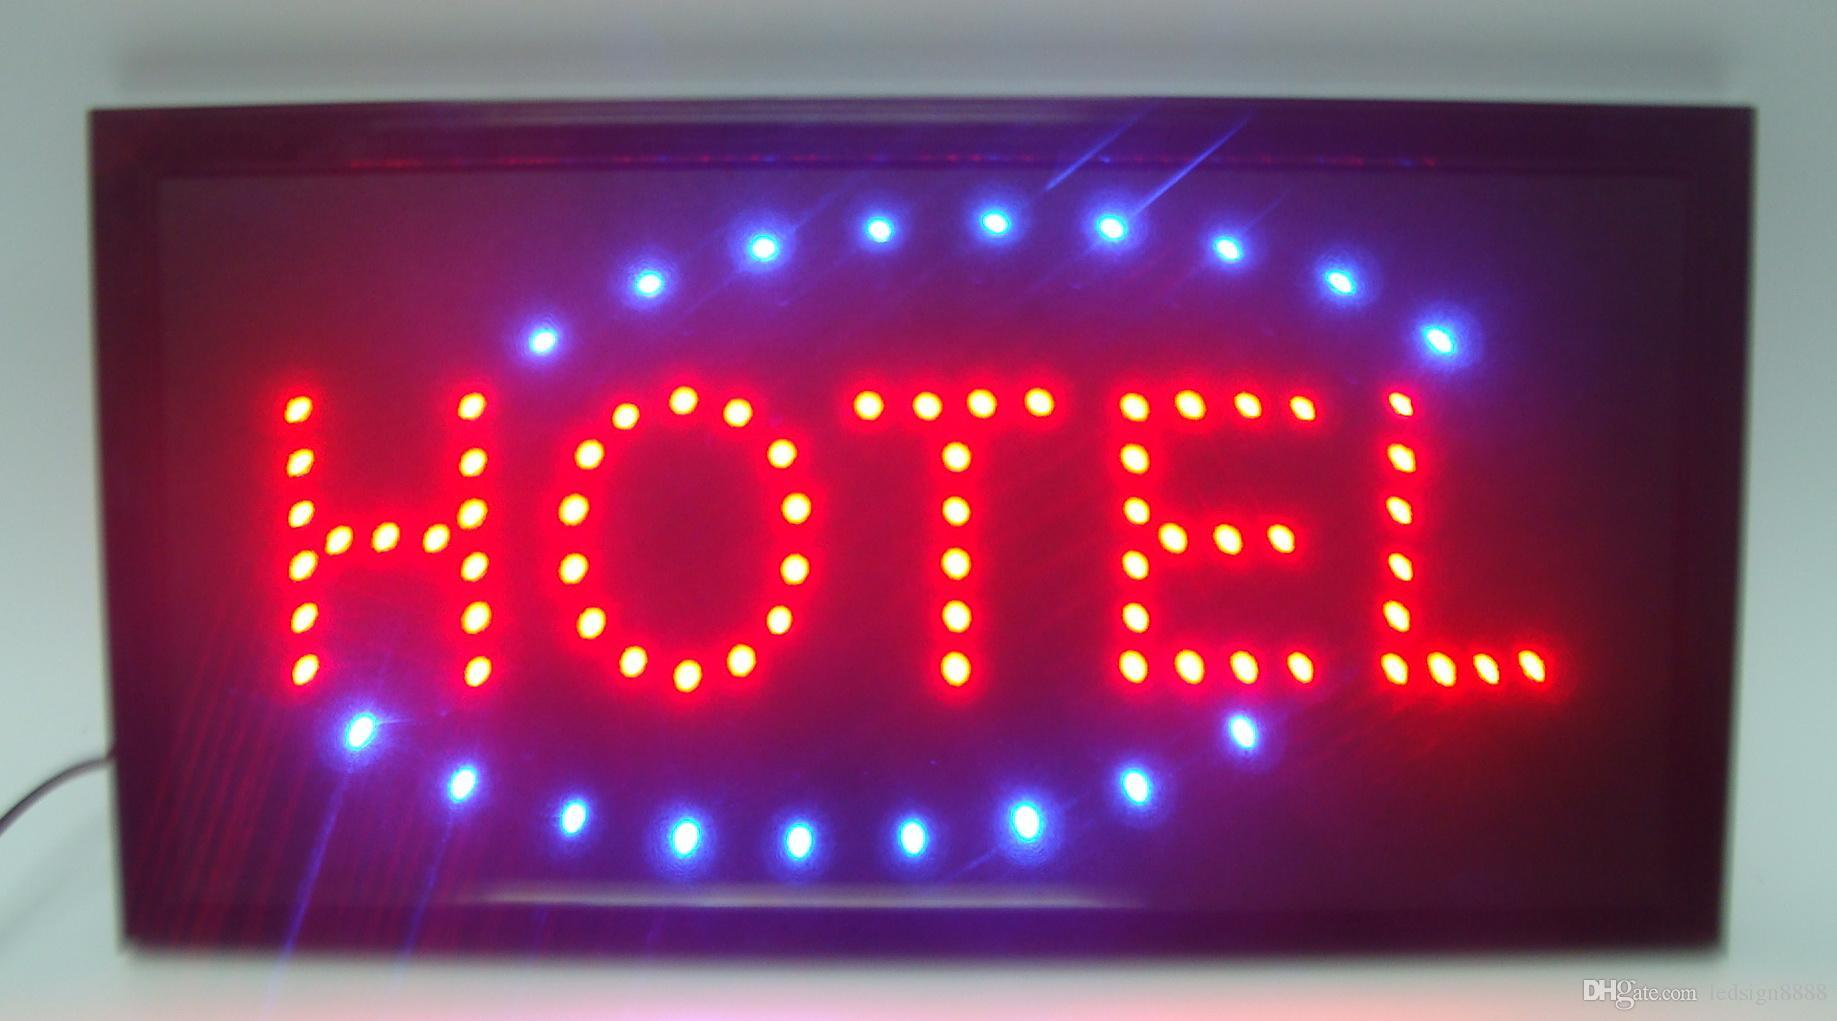 LED Hotel Schild 10x19 Zoll Indoor Ultra Hell Running Hotel Shop Neon Light Sign Board